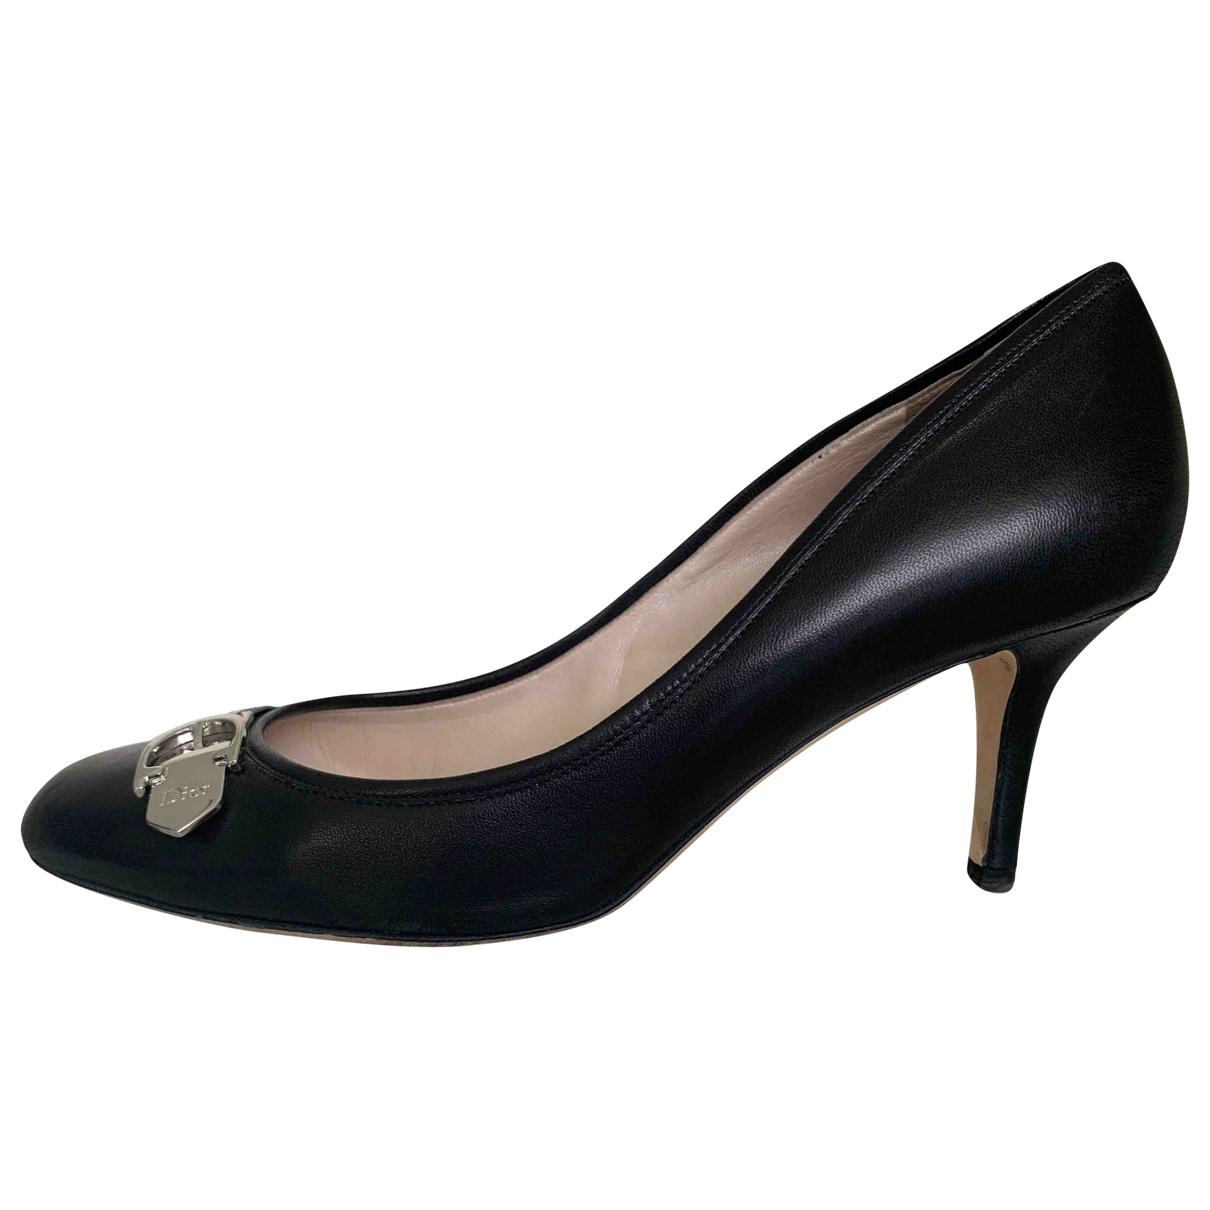 Dior \N Black Leather Heels for Women 39 EU